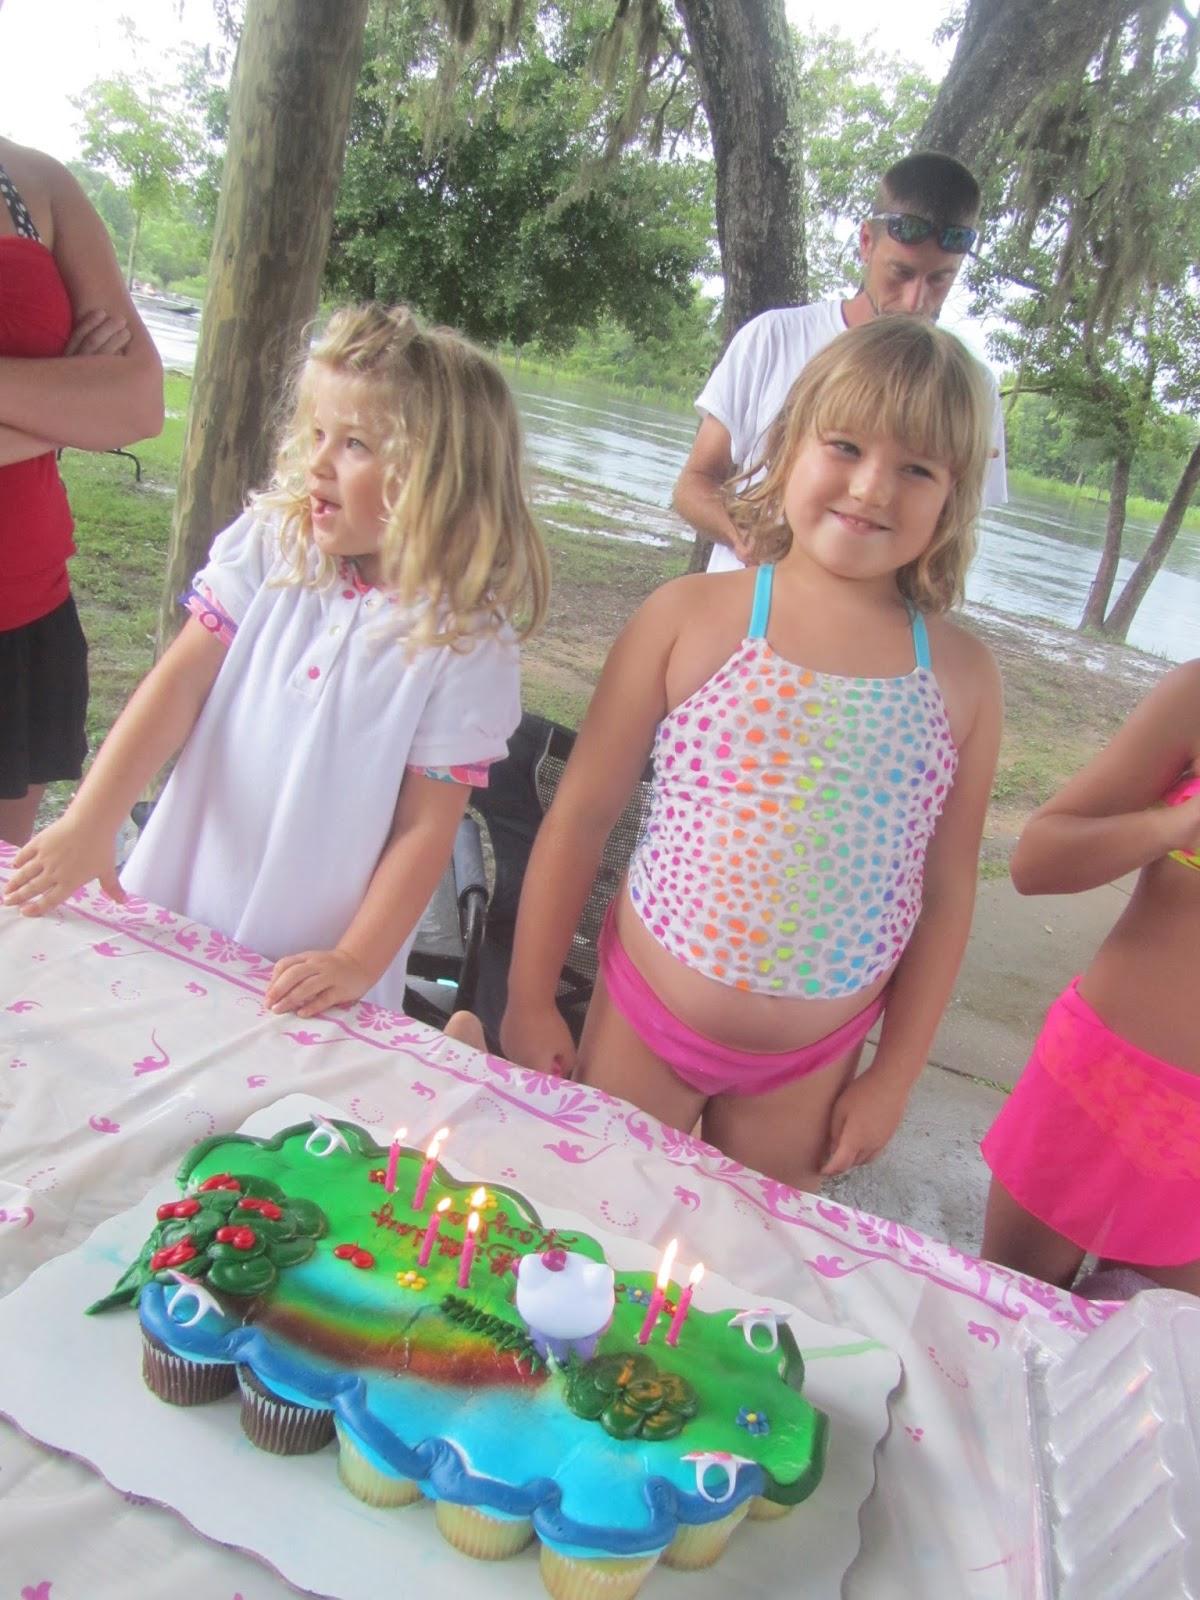 All Blacks Kaylea S 9th Birthday Party